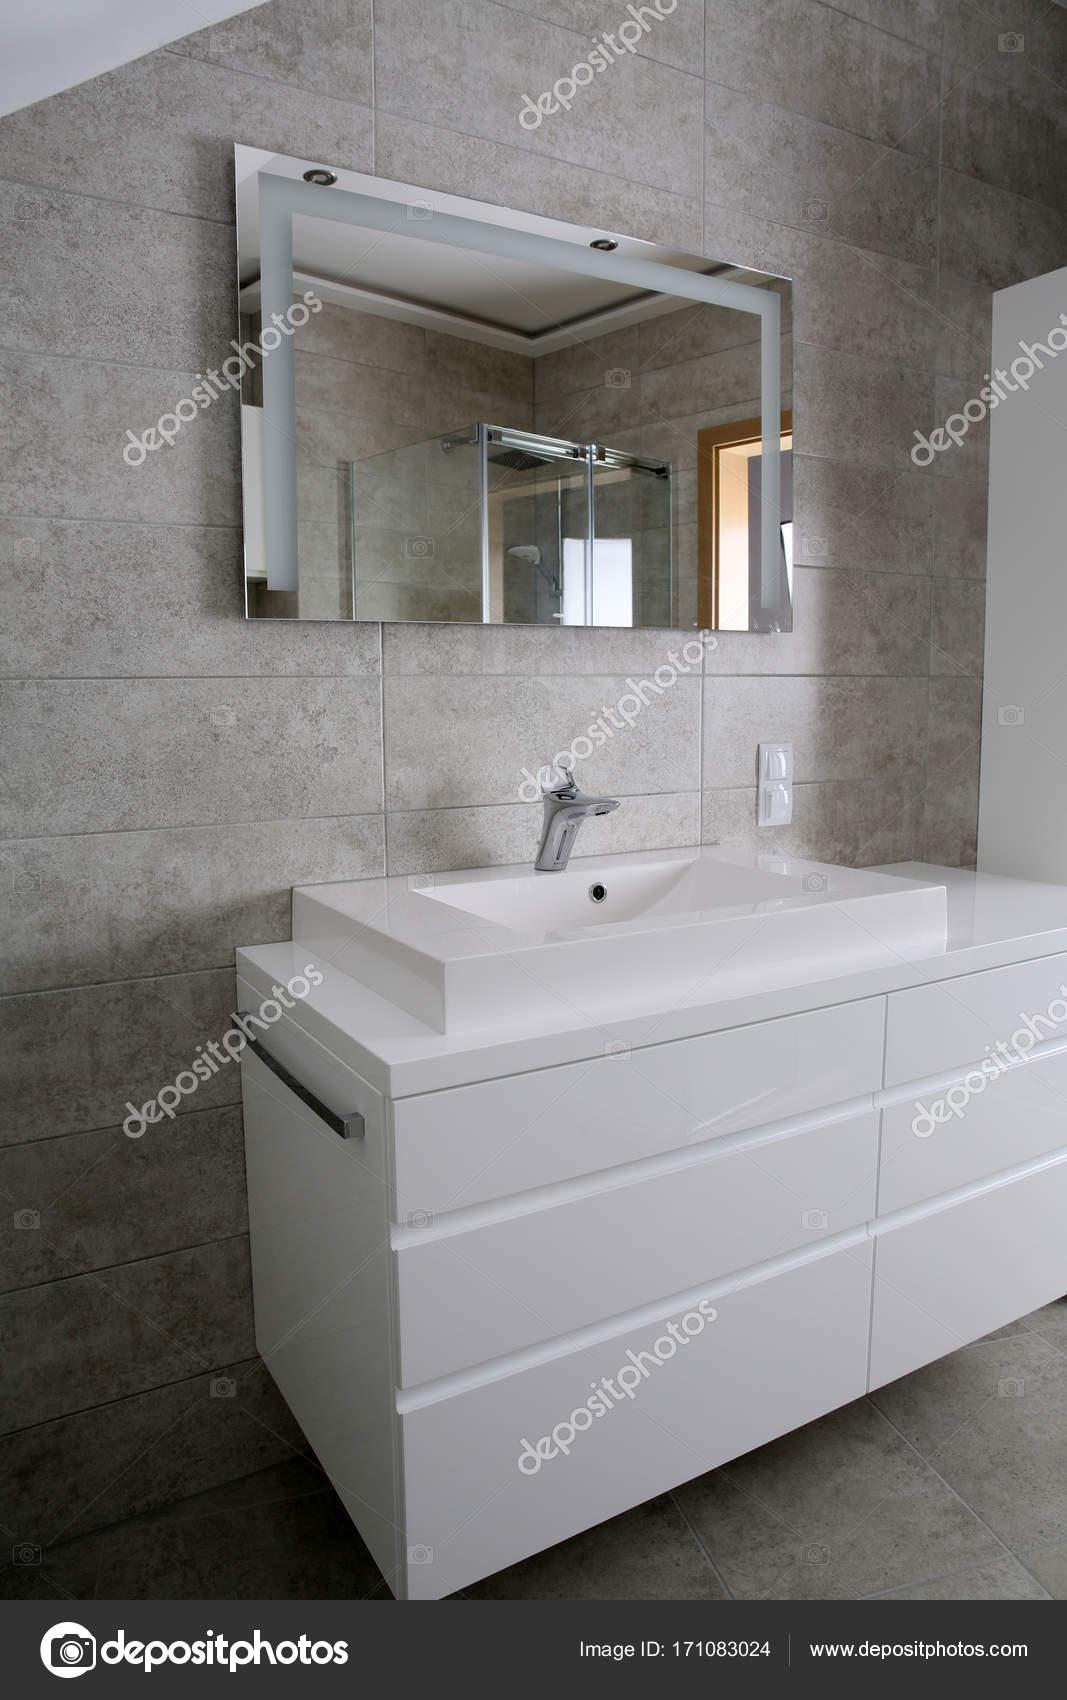 Ingerichte badkamer met witte meubels — Stockfoto © KrzysztofWinnik ...